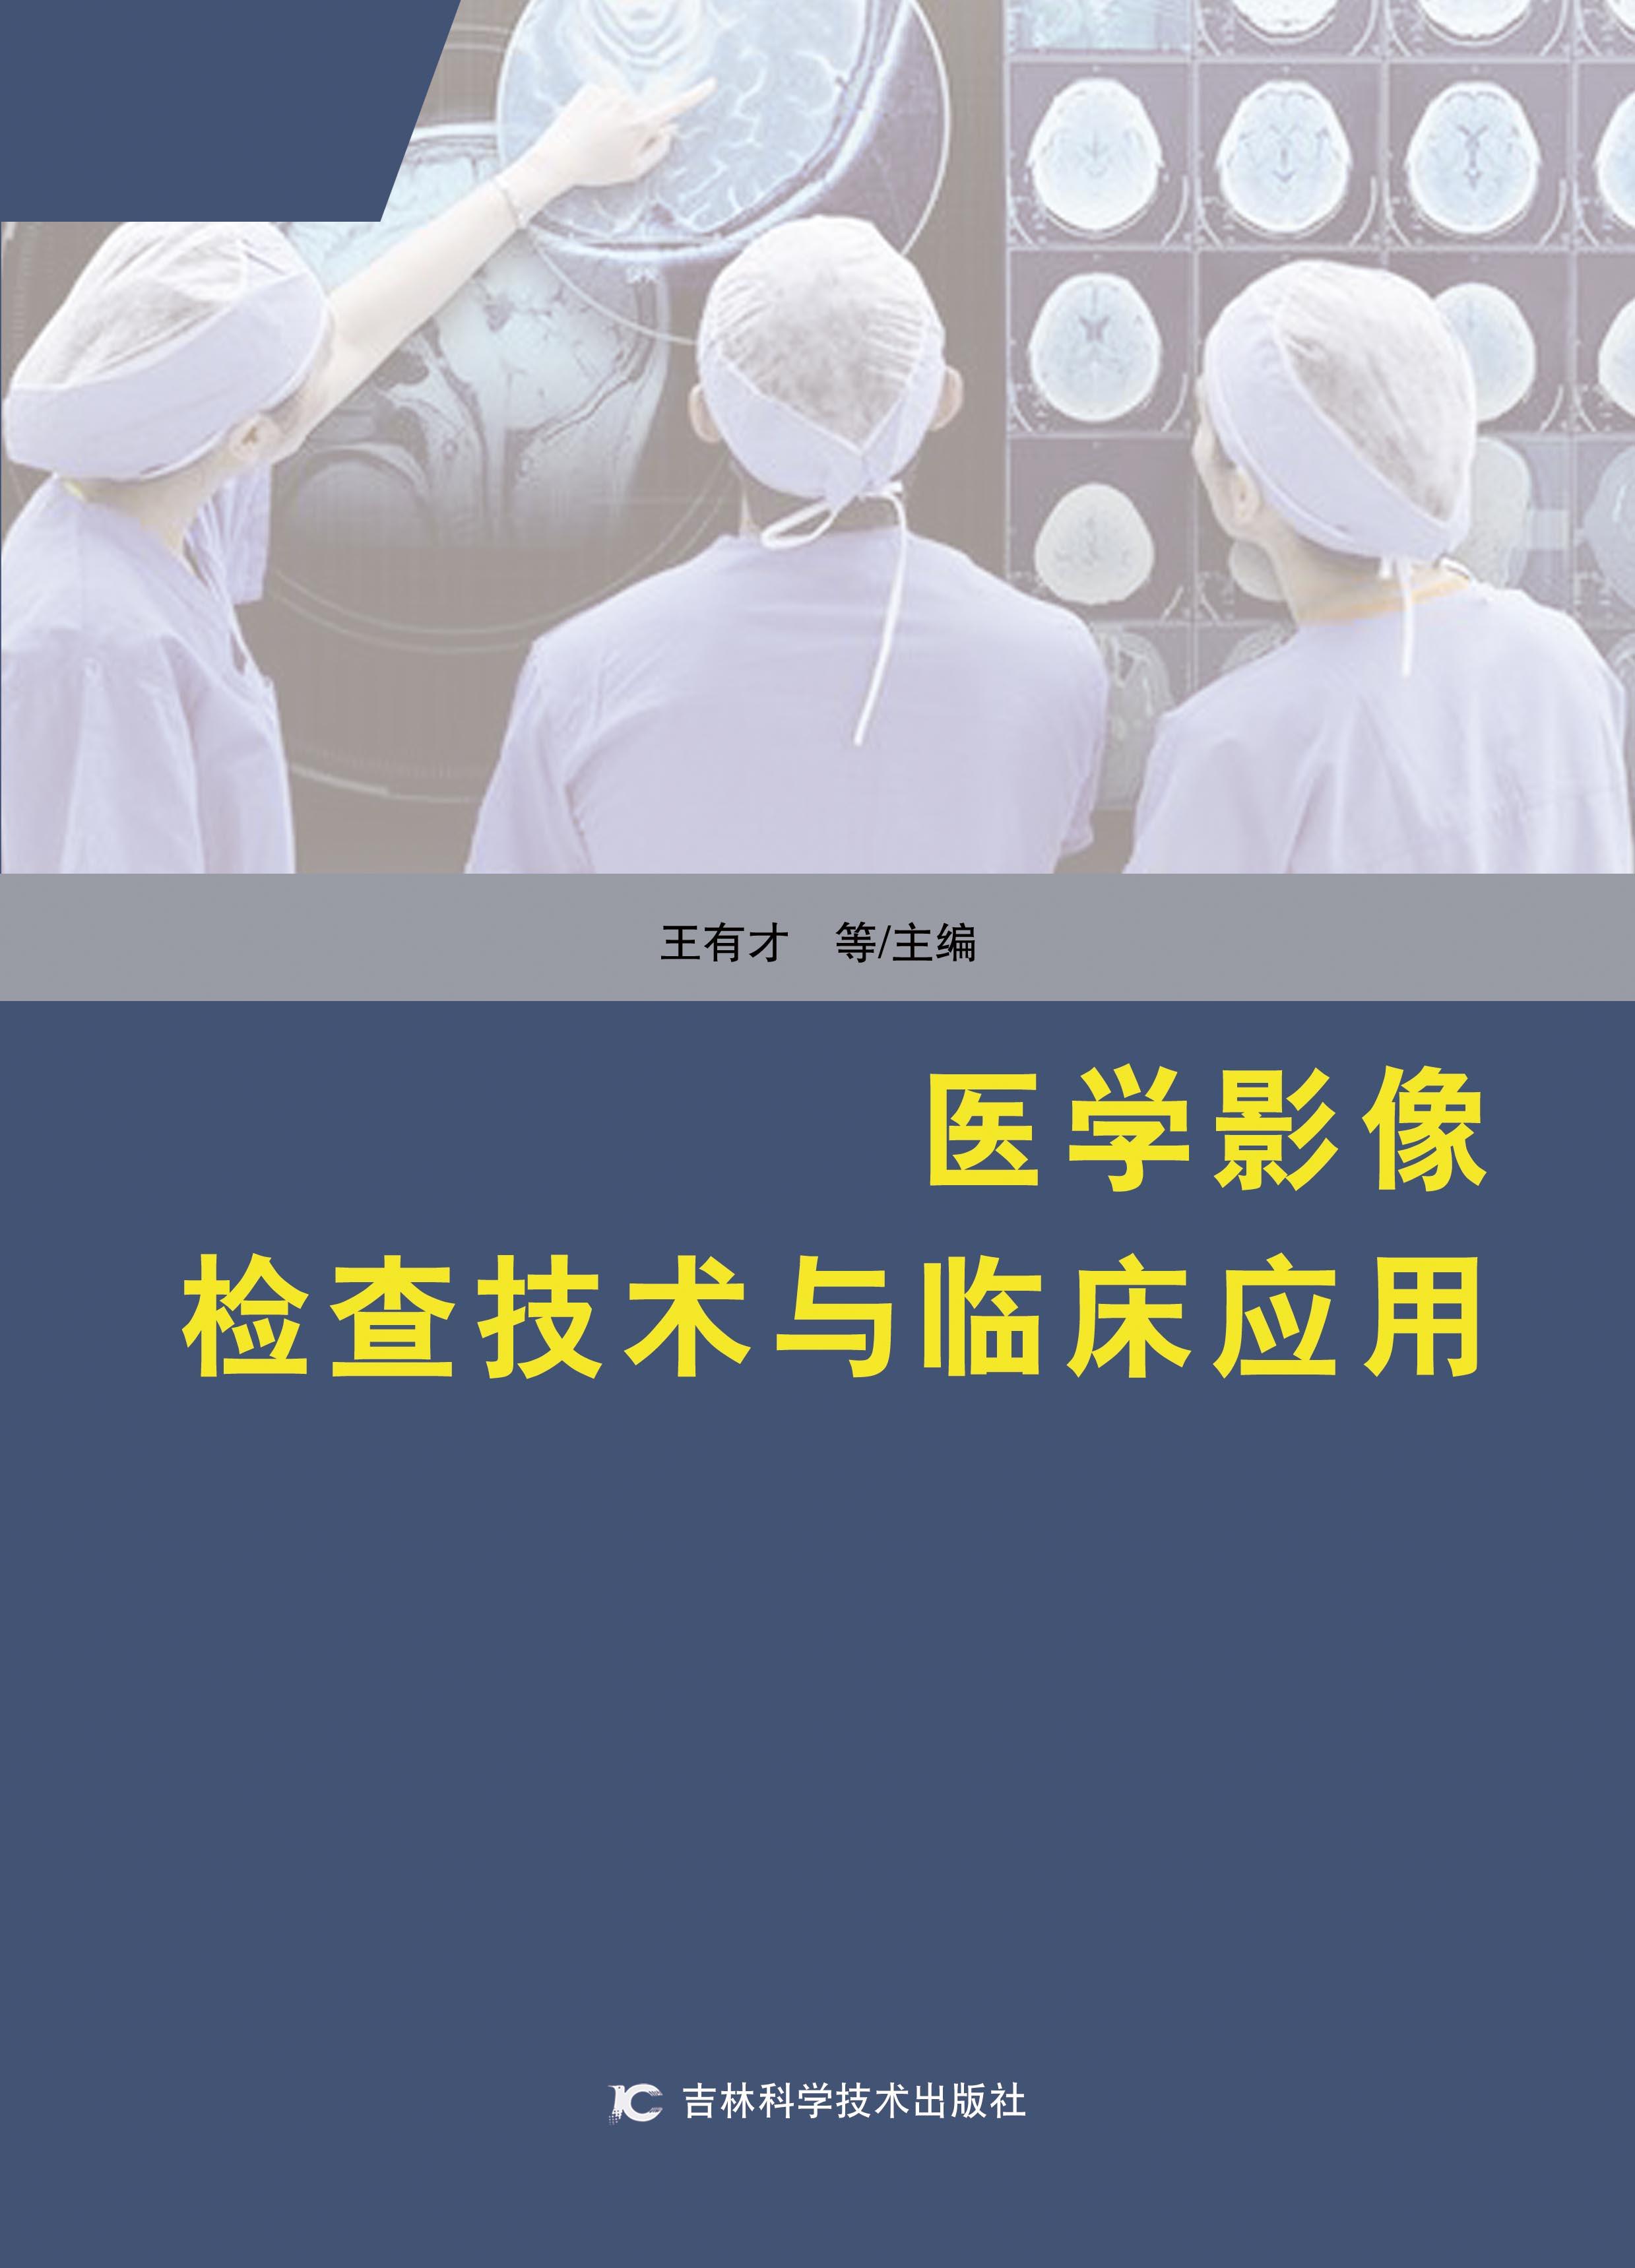 title='医学影像检查技术与临床应用'